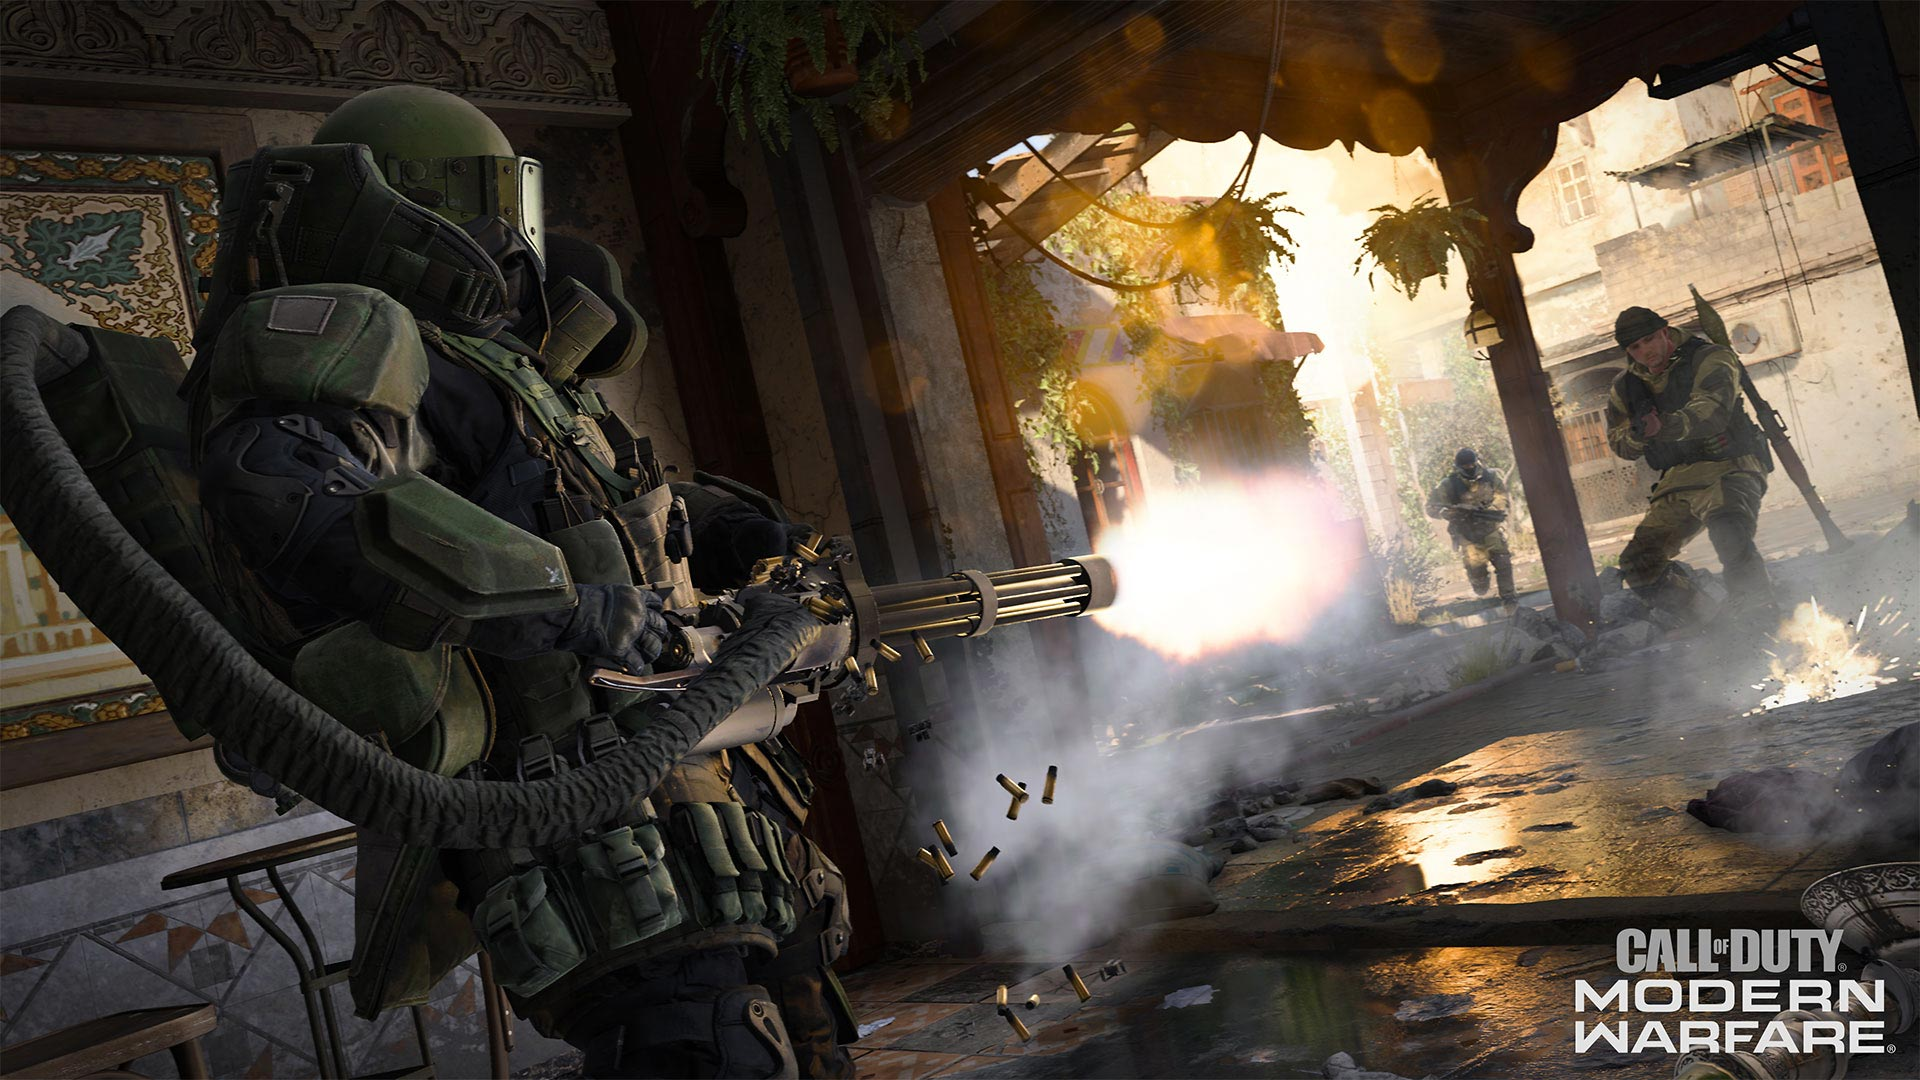 Call of Duty: Modern Warfare juggernaut